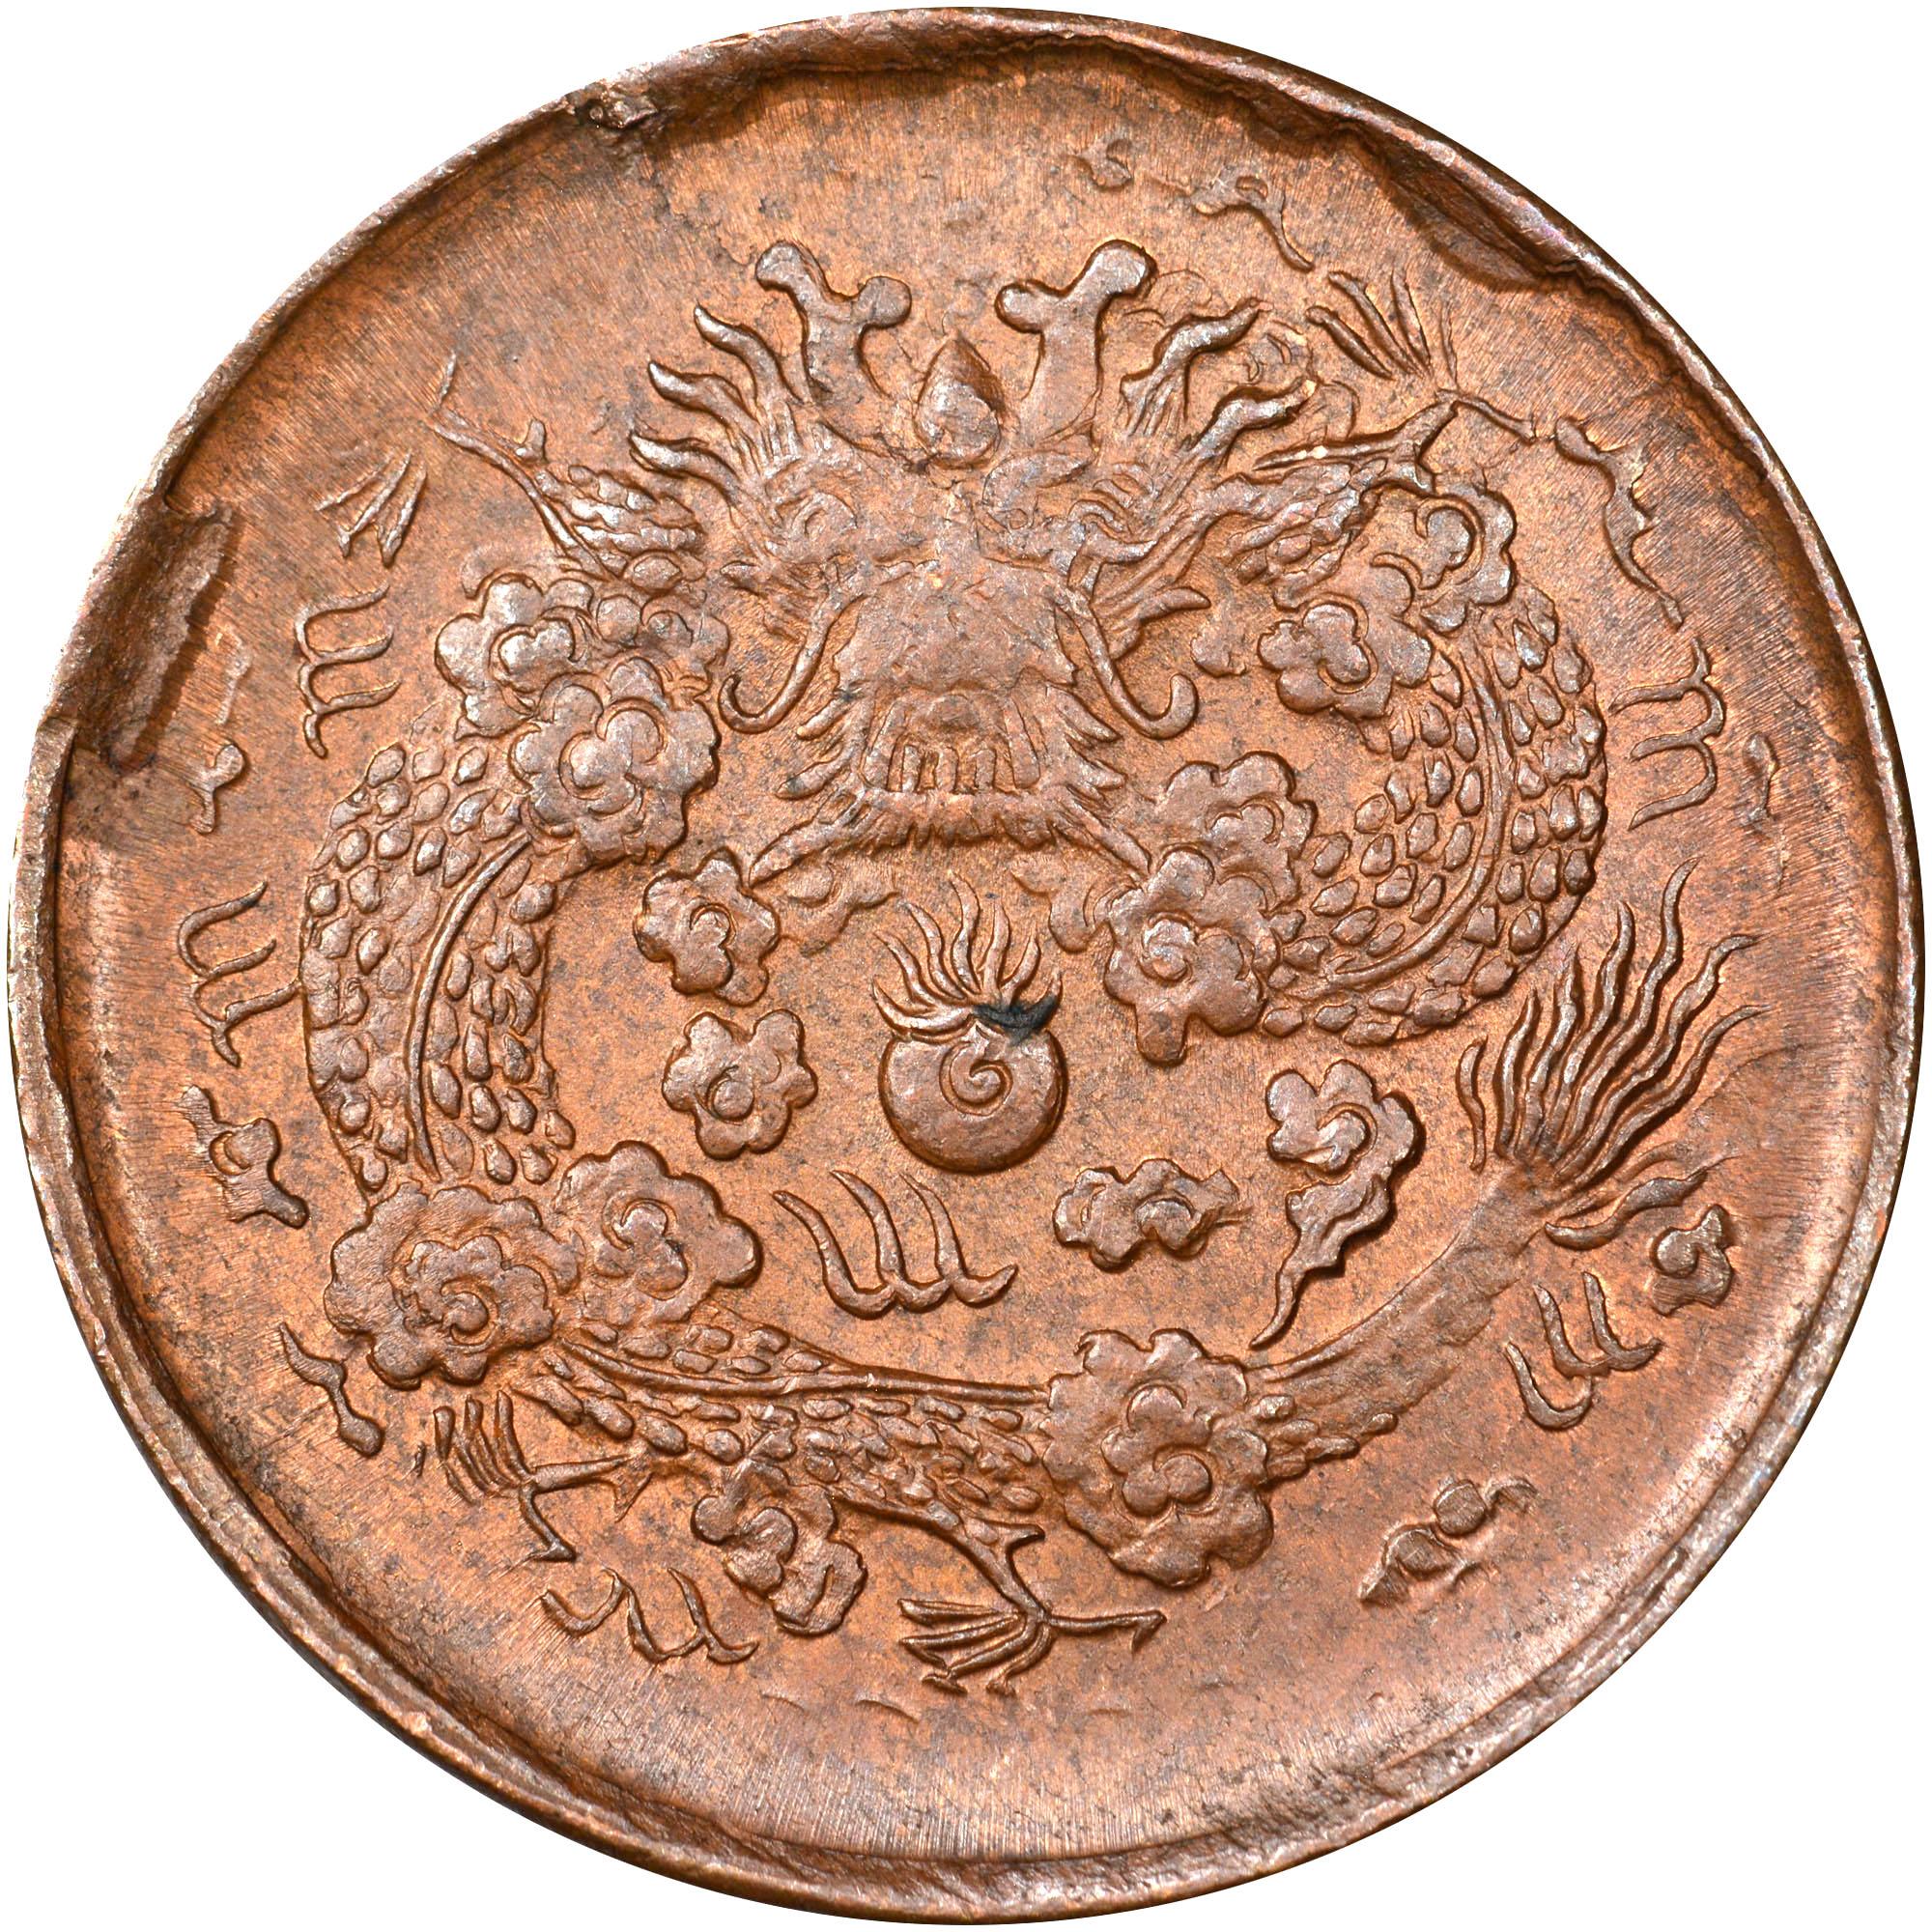 1905-1906 China EMPIRE 2 Cash reverse